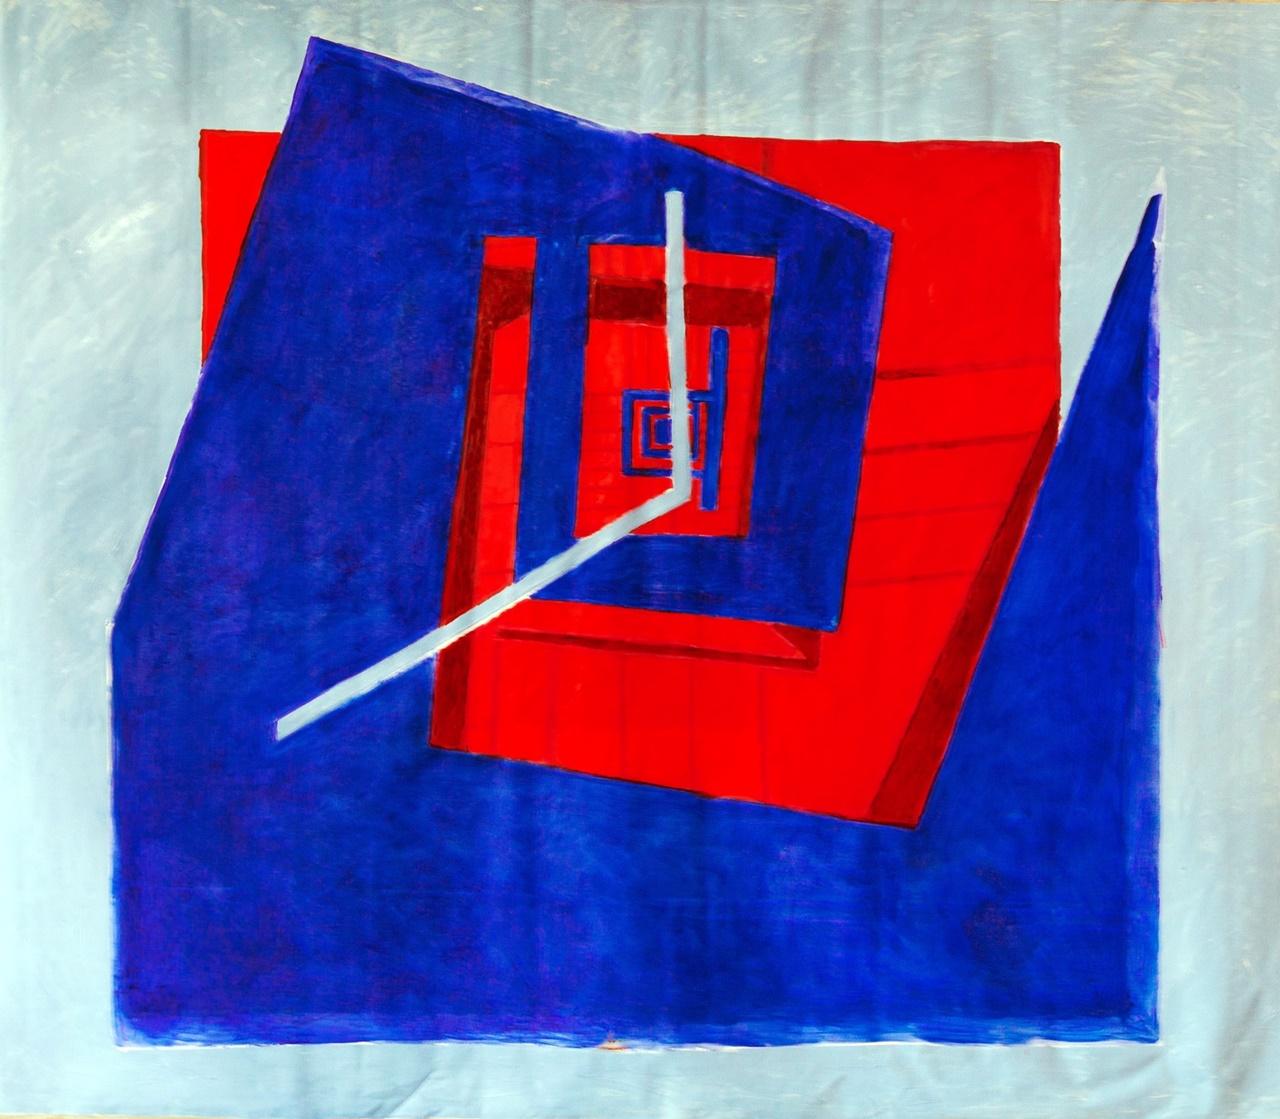 Marta Kawecka_Escape room_160x190cm_olej na płotnie_2019